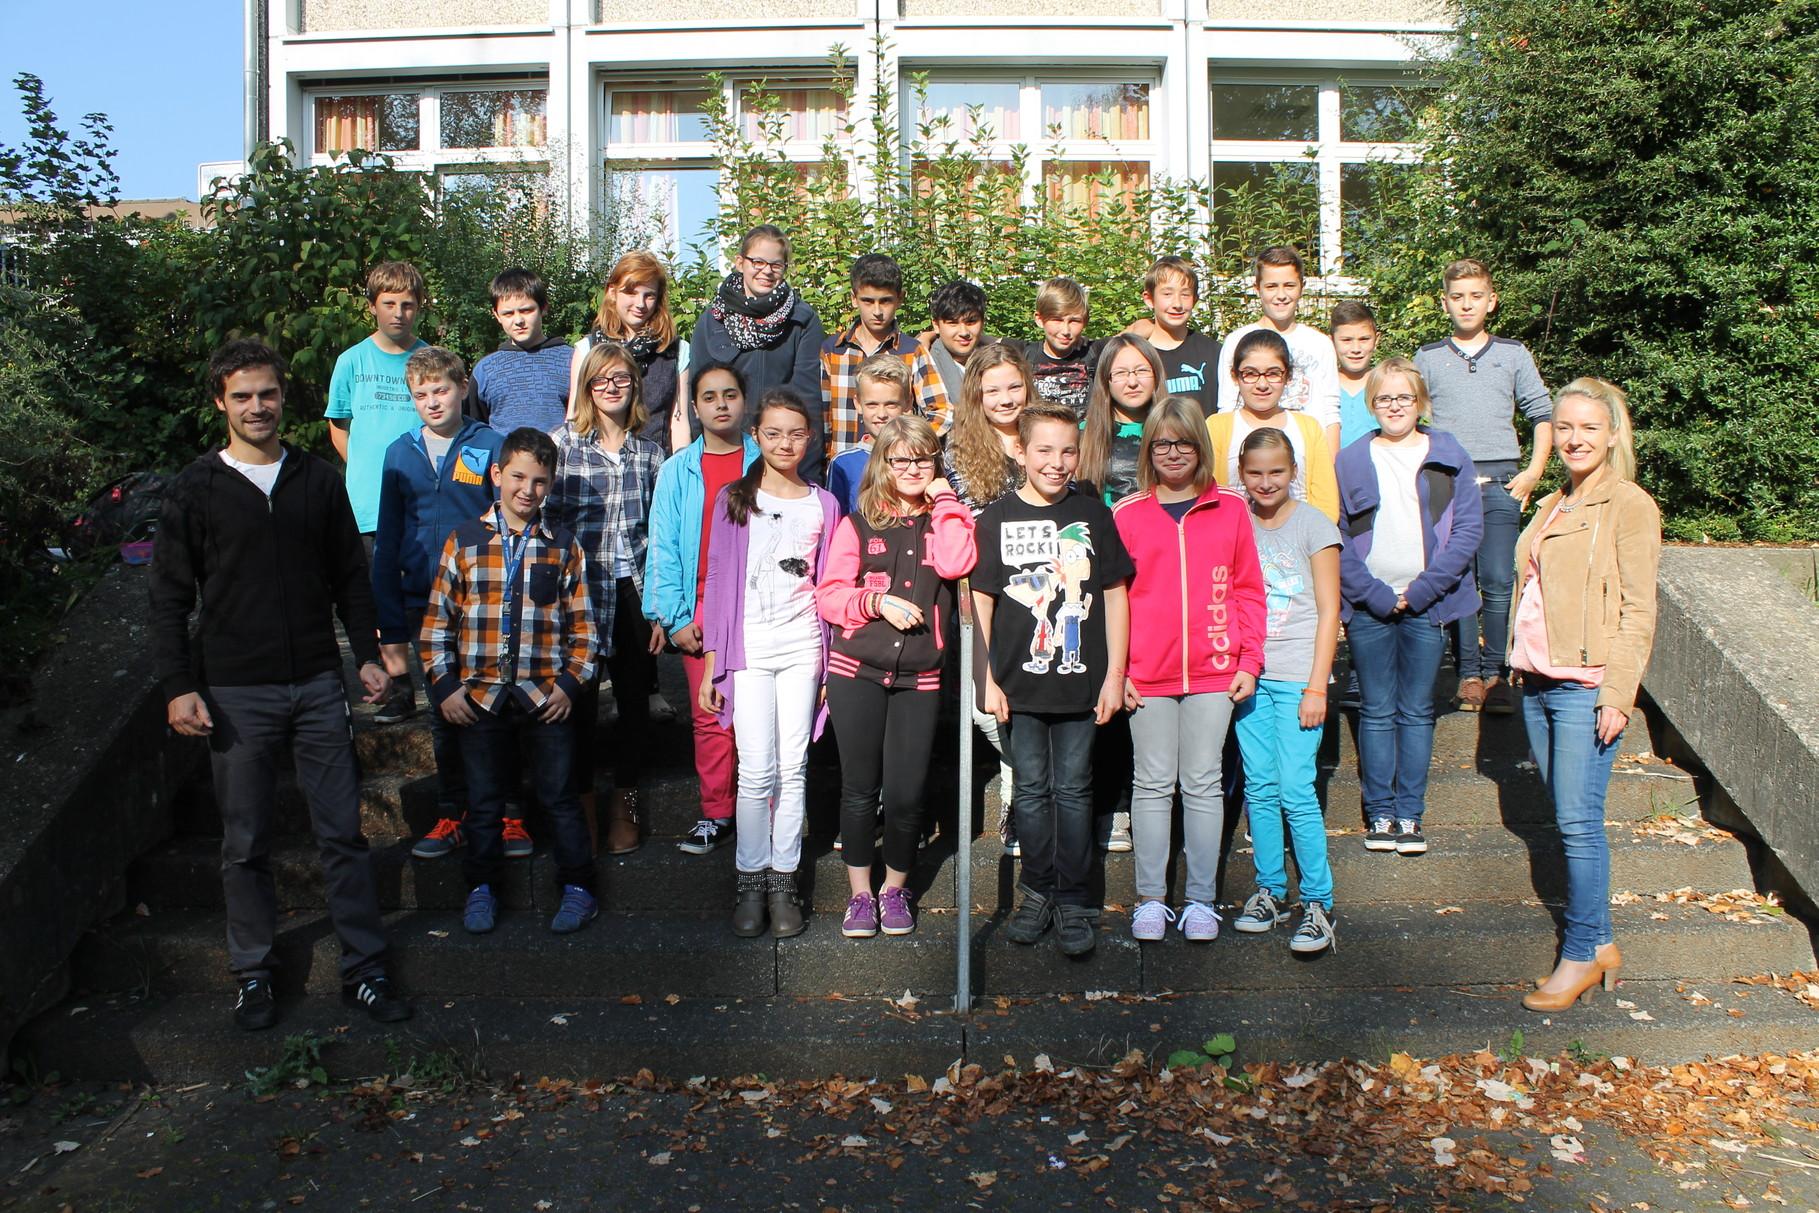 6b - Klassenlehrer: Frau Blefgen und Herr Reuter